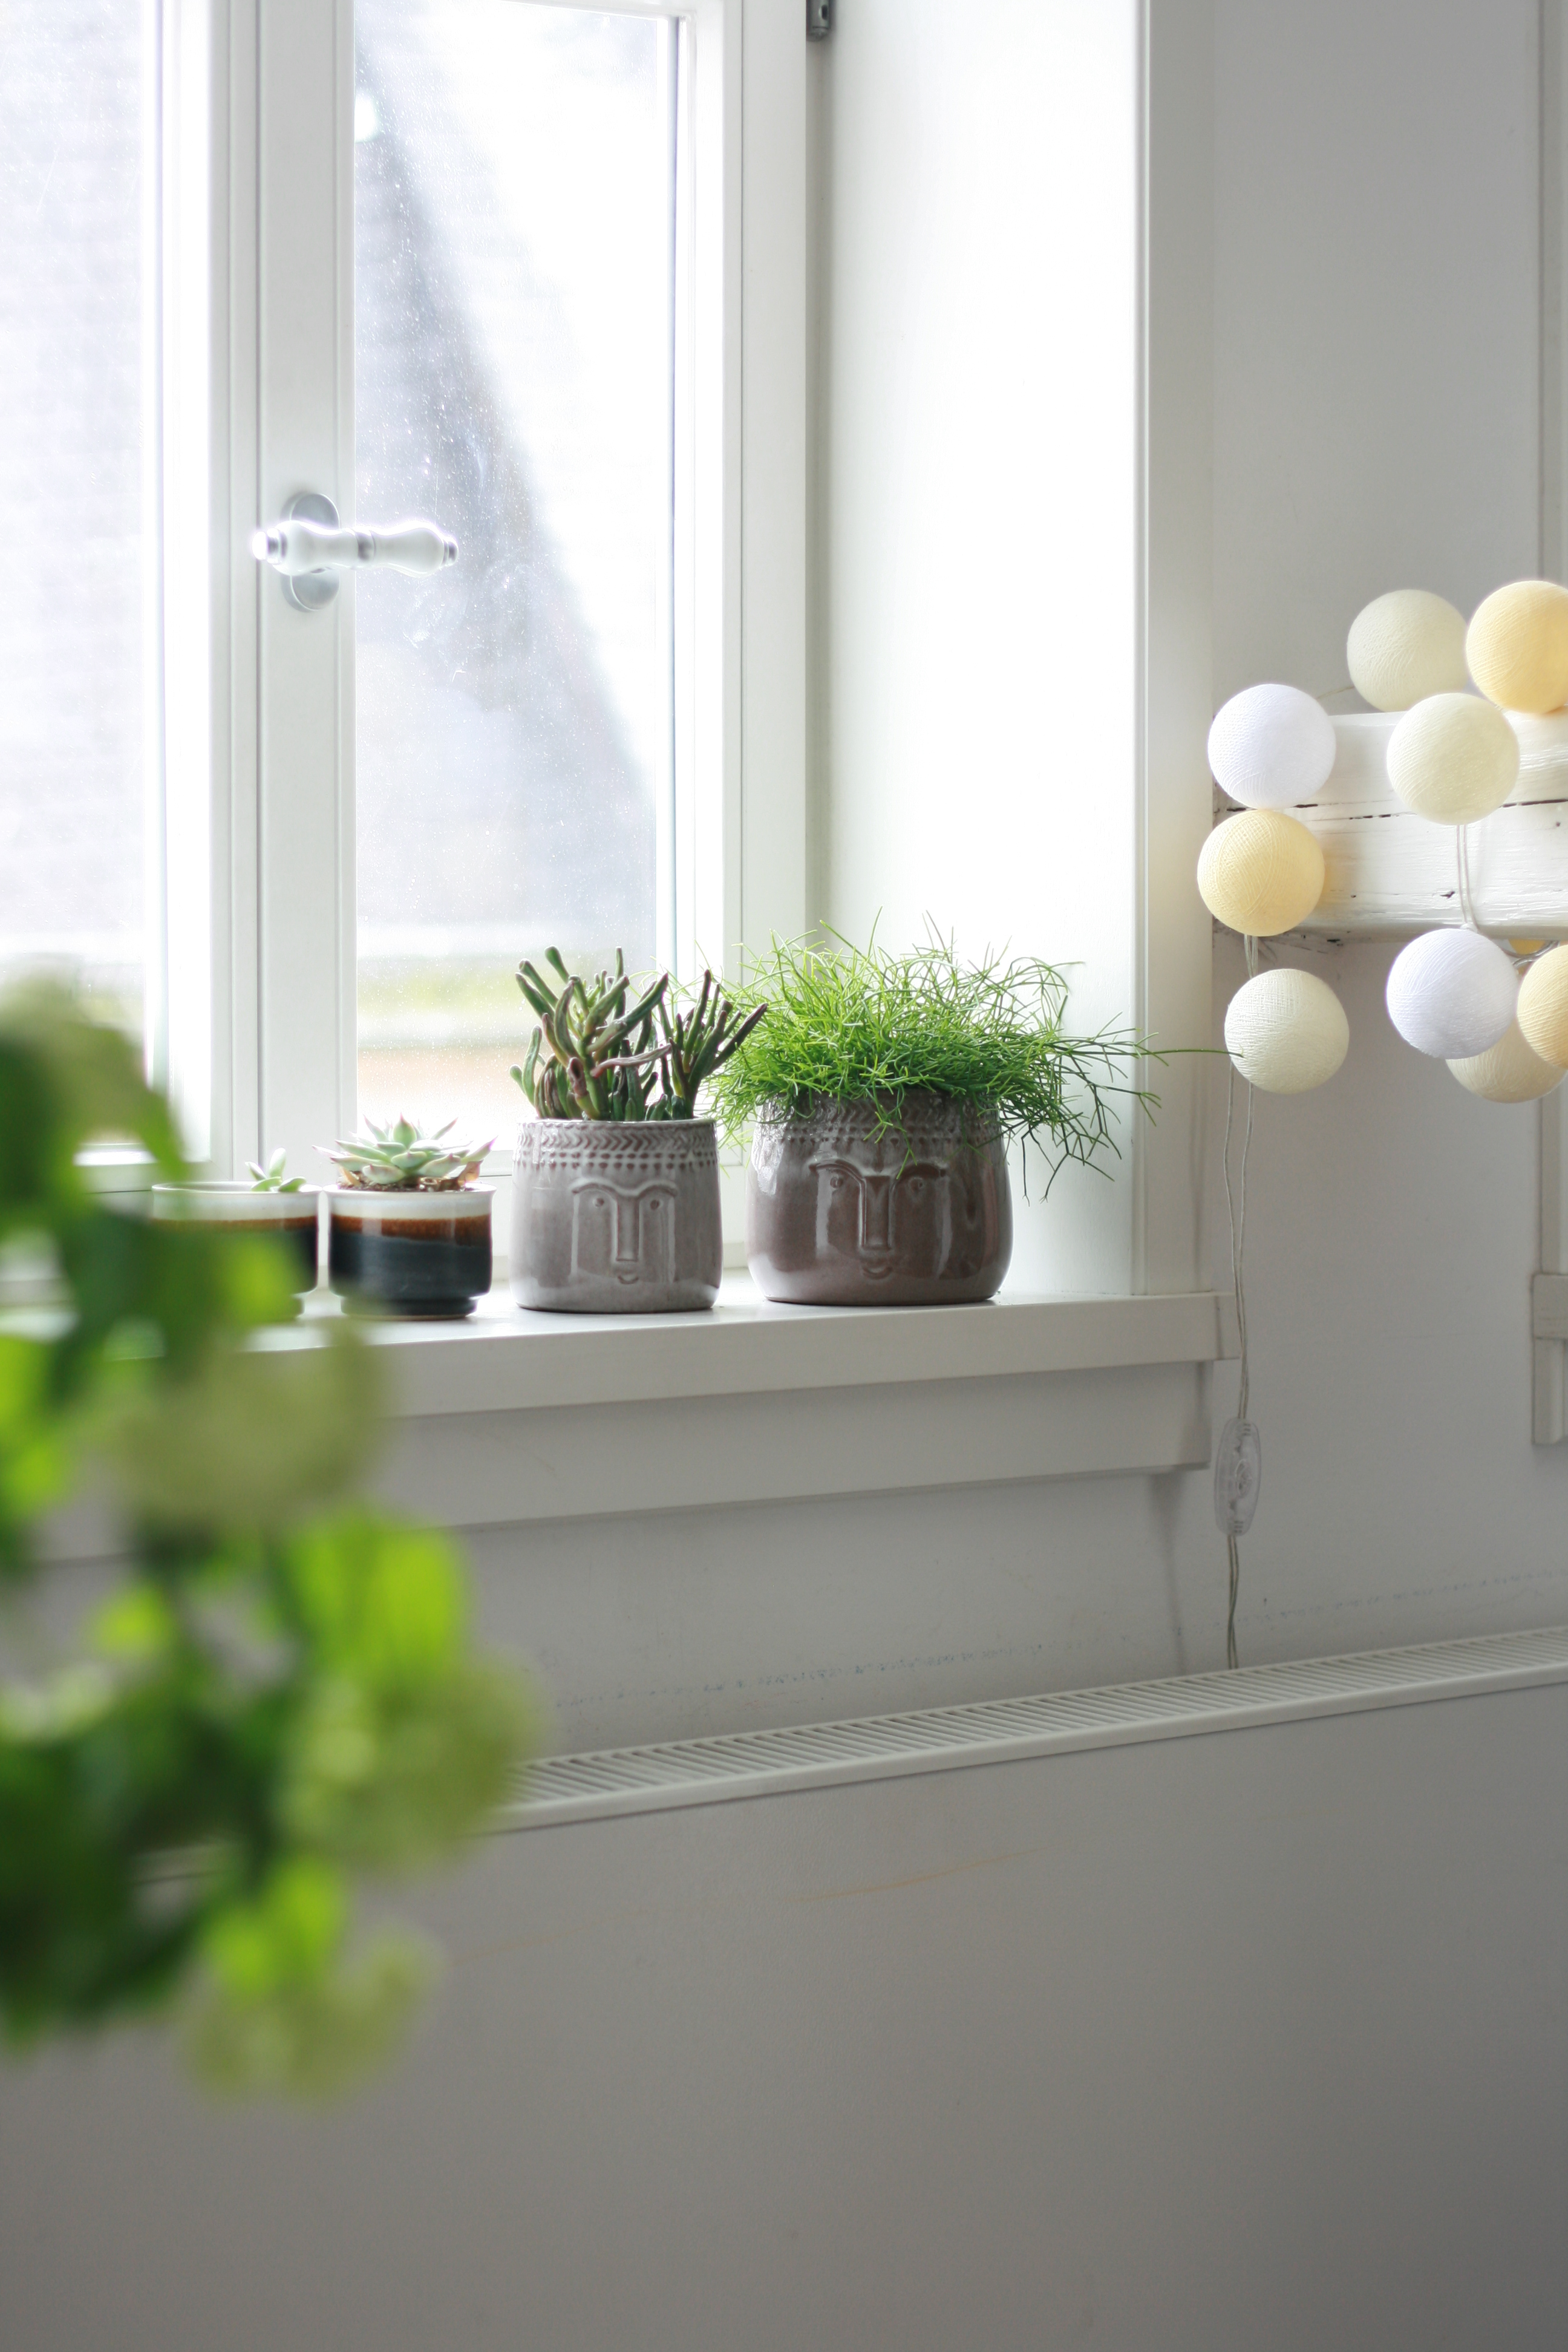 fundst ck der woche mitbringsel my home is my horst. Black Bedroom Furniture Sets. Home Design Ideas